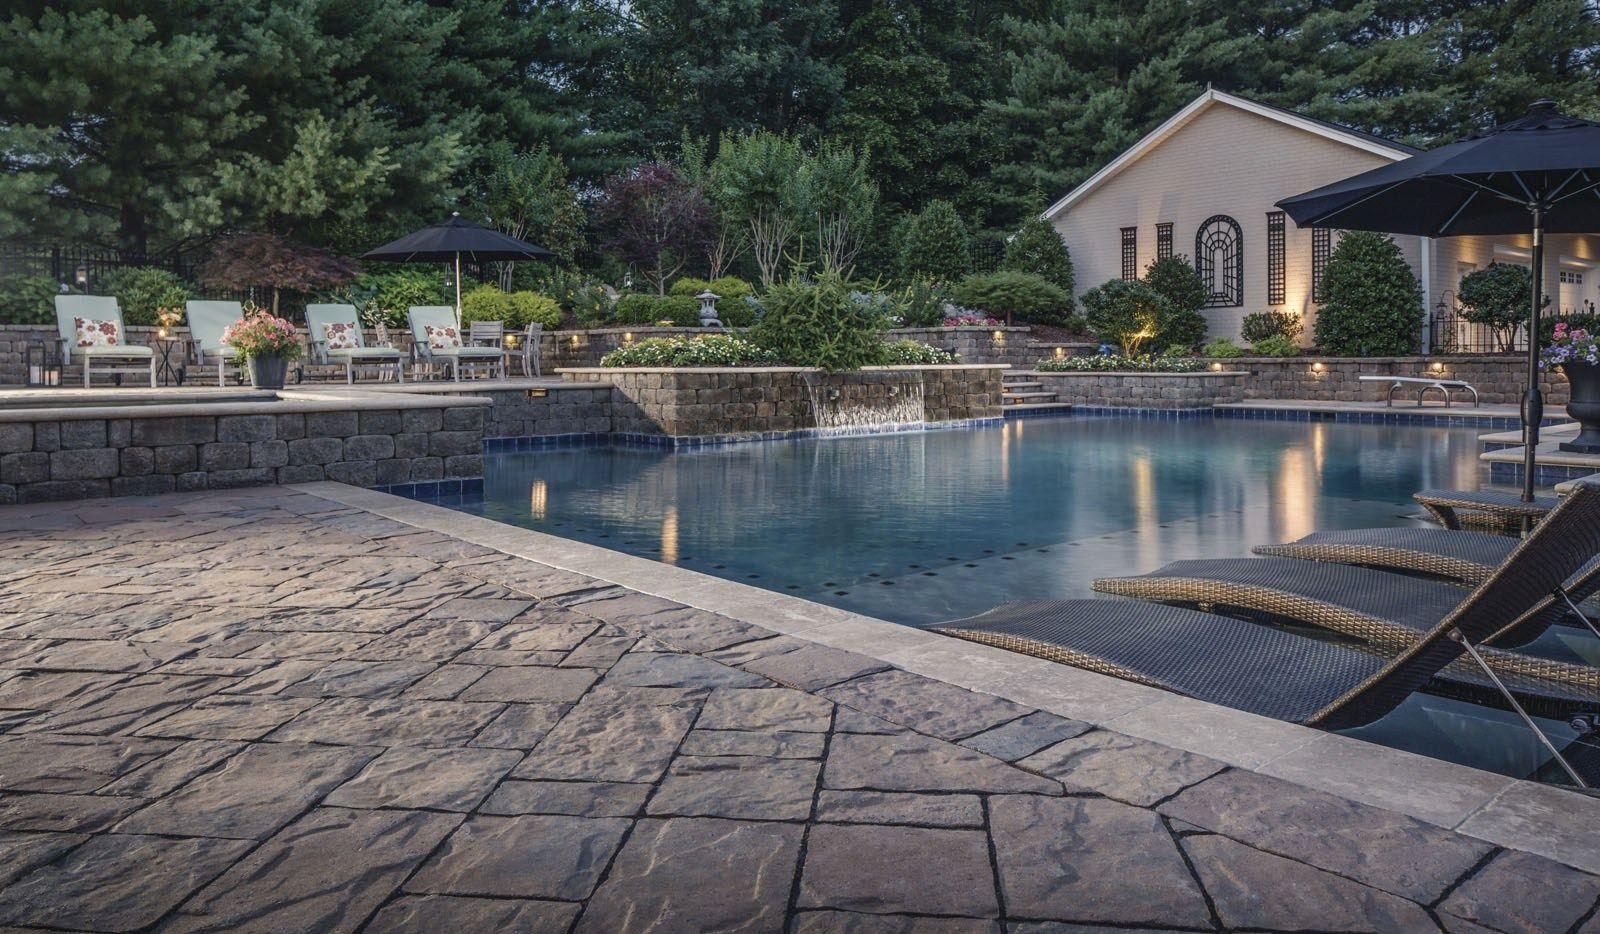 Pool Deck Patio Design Trends In 2017 Belgard Blog Flagstone Pool Decks Hardscape Patio Patio Deck